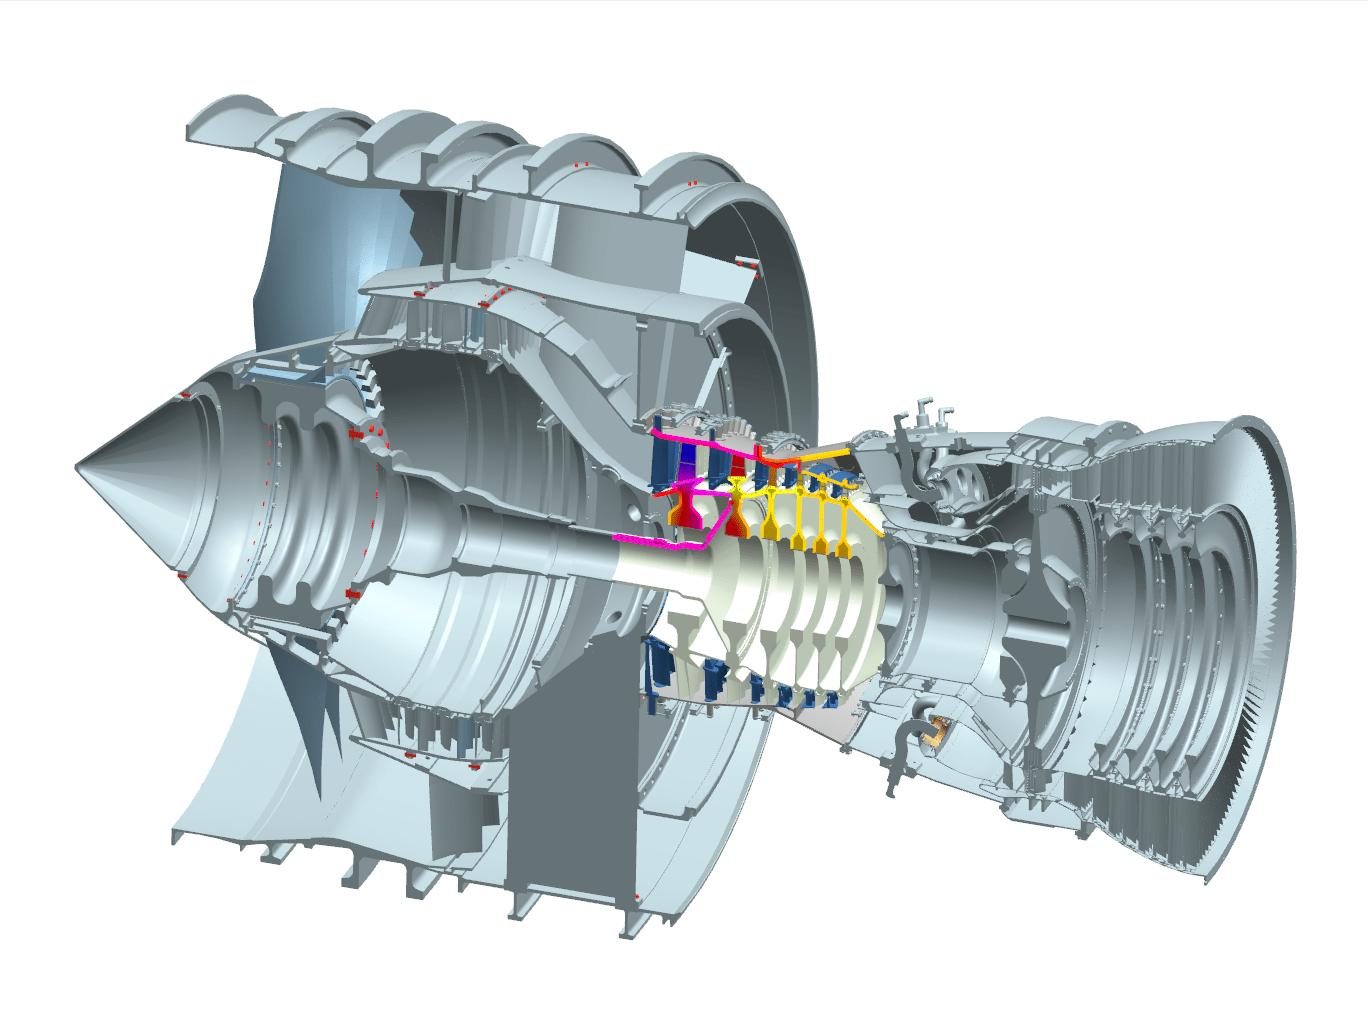 NX CAD Aero Engine